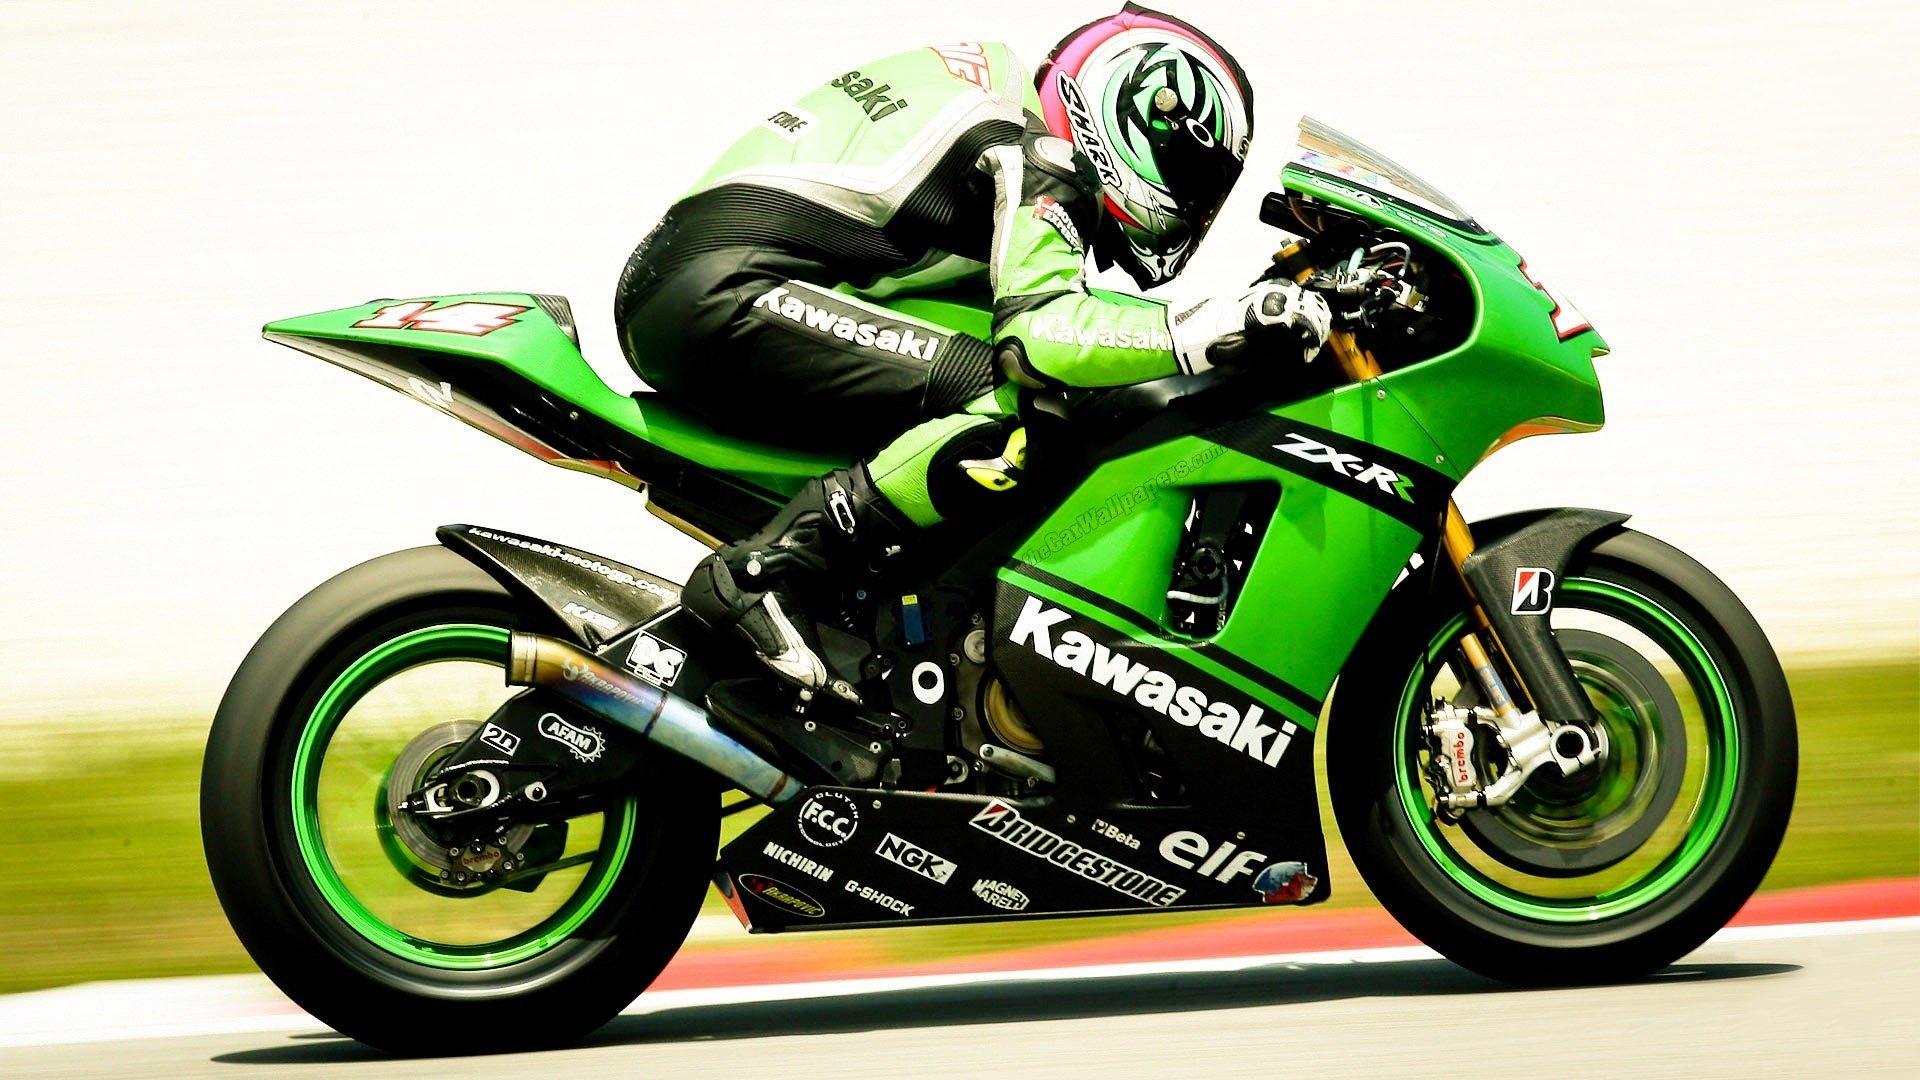 Insane Kawasaki Bike Hd Wallpaper: Kawasaki Full HD Wallpaper And Background